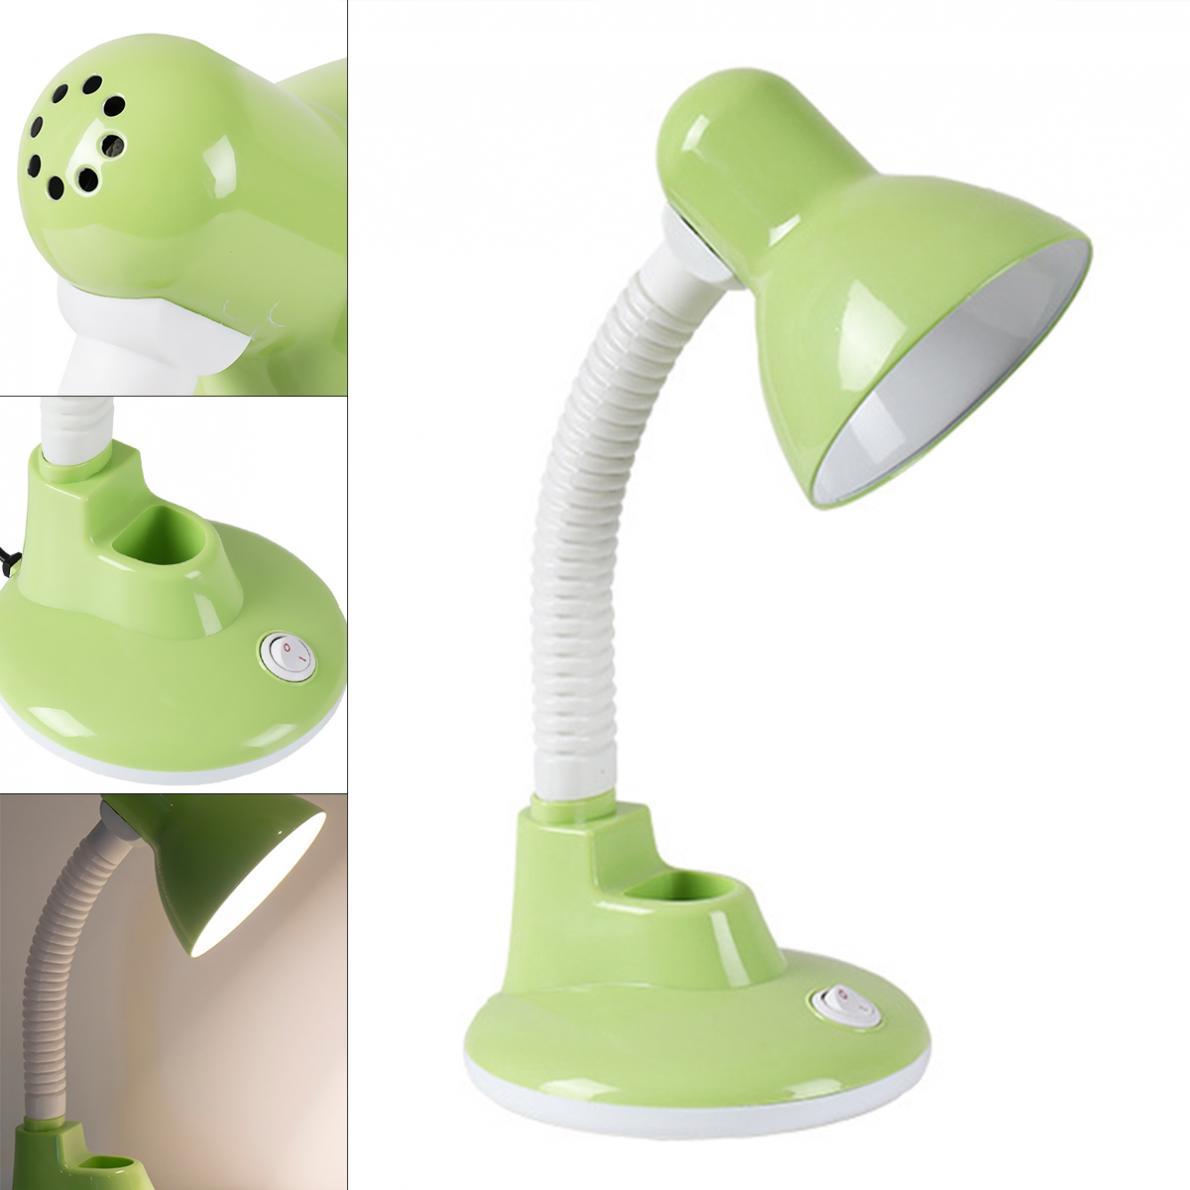 Lámpara de mesa LED E27 para el hogar, lámpara de escritorio portátil para estudio de aprendizaje de oficina con contenedor de bolígrafo para niños, oficina, cabecera